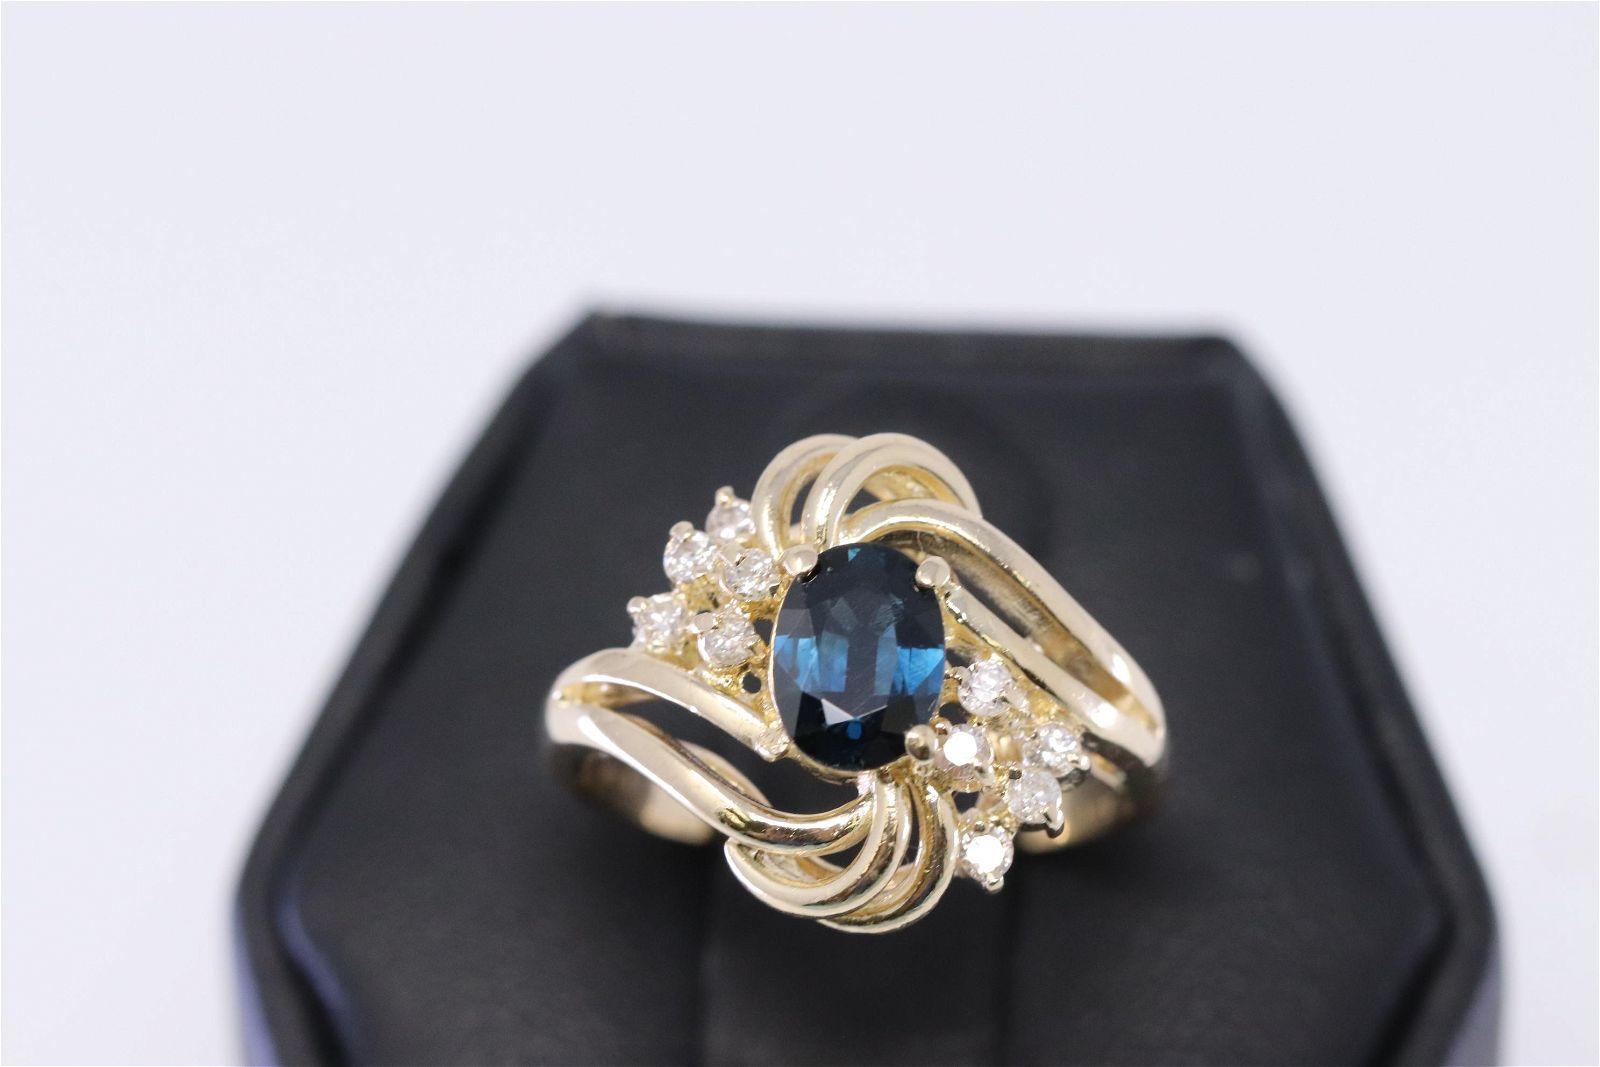 14Kt Diamond/Sapphire Ring